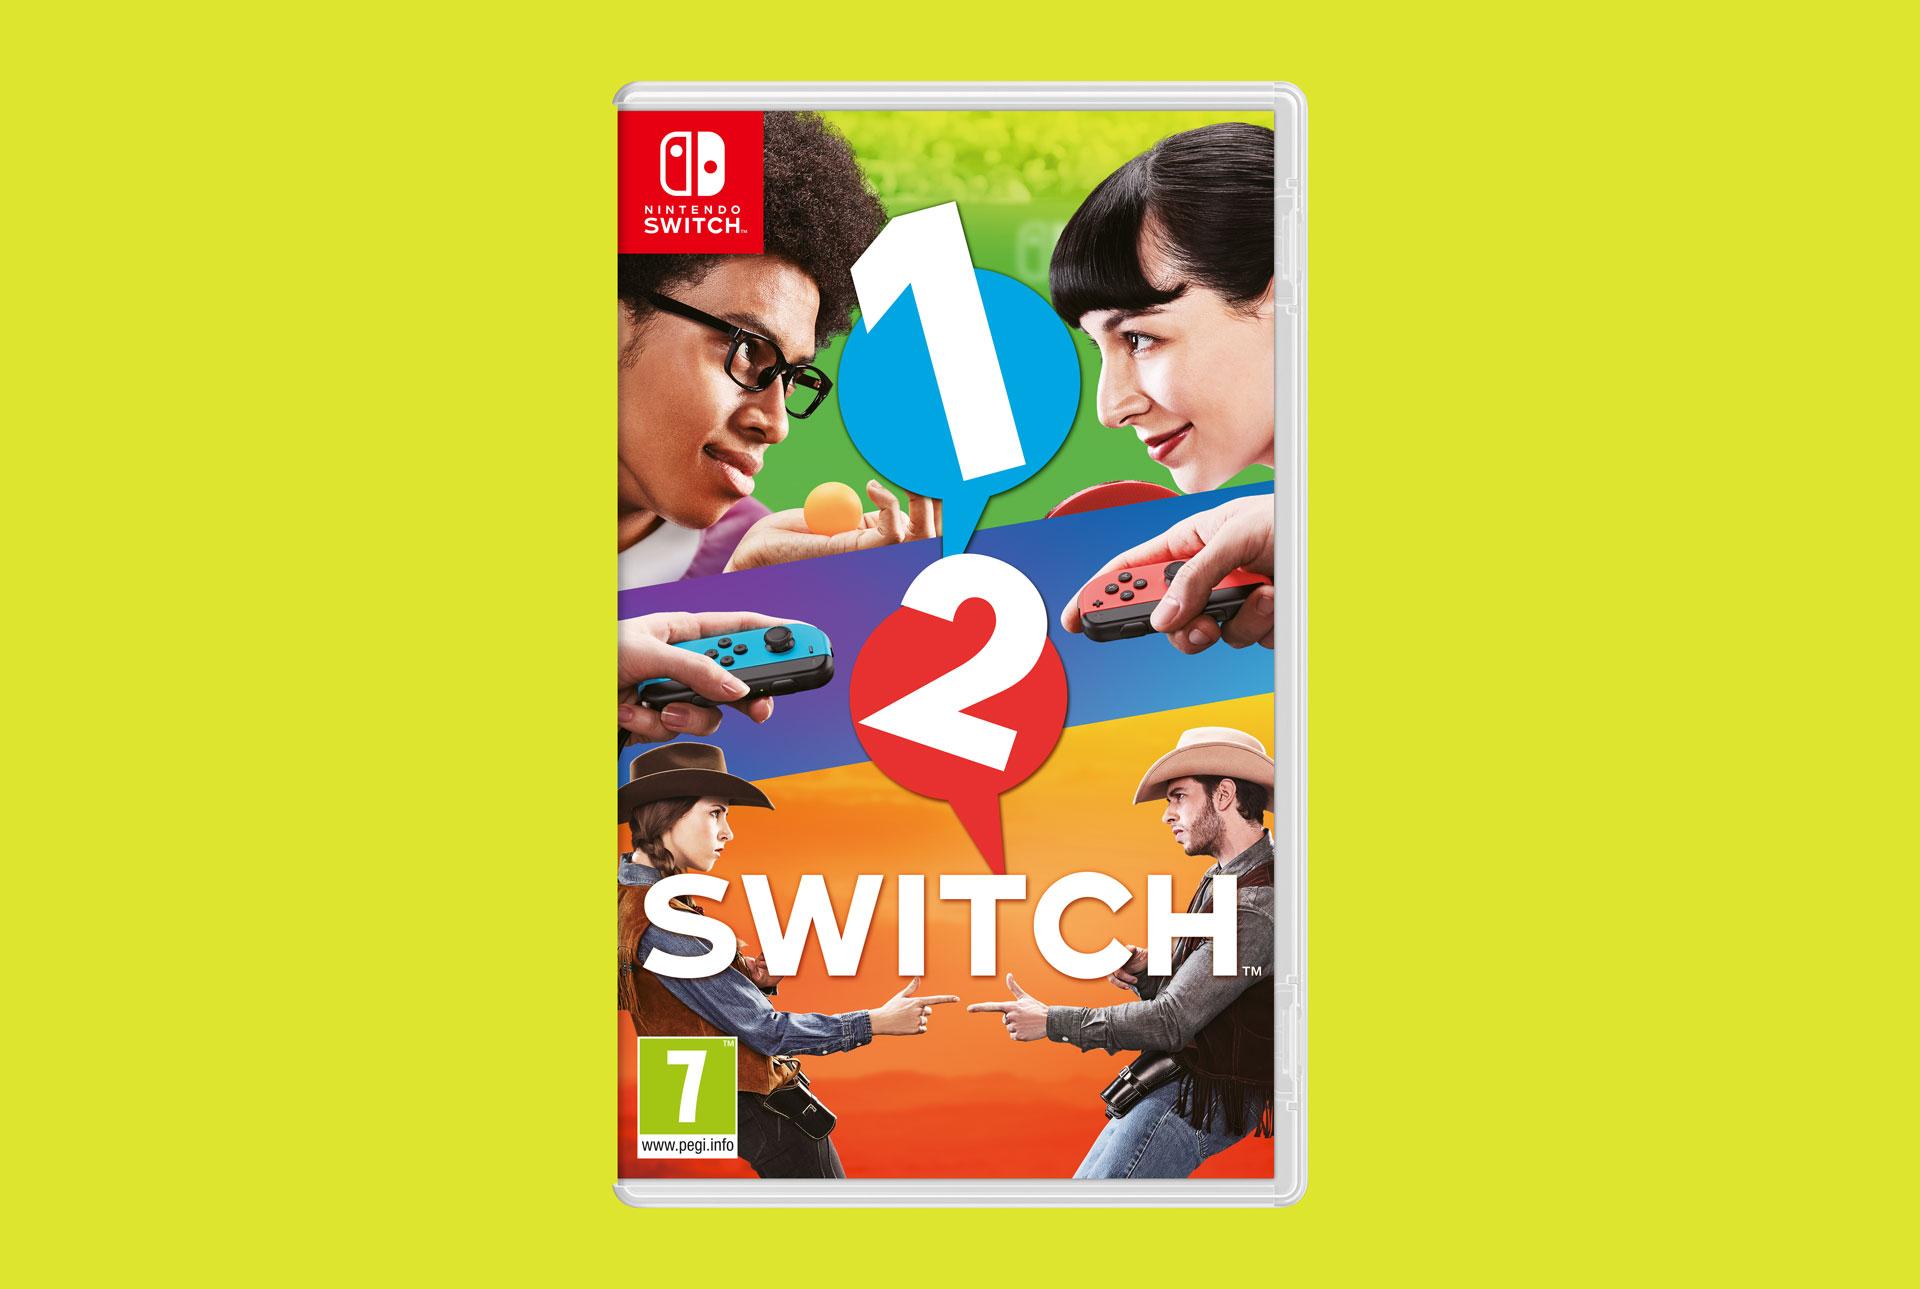 1-2-Switch Packshot